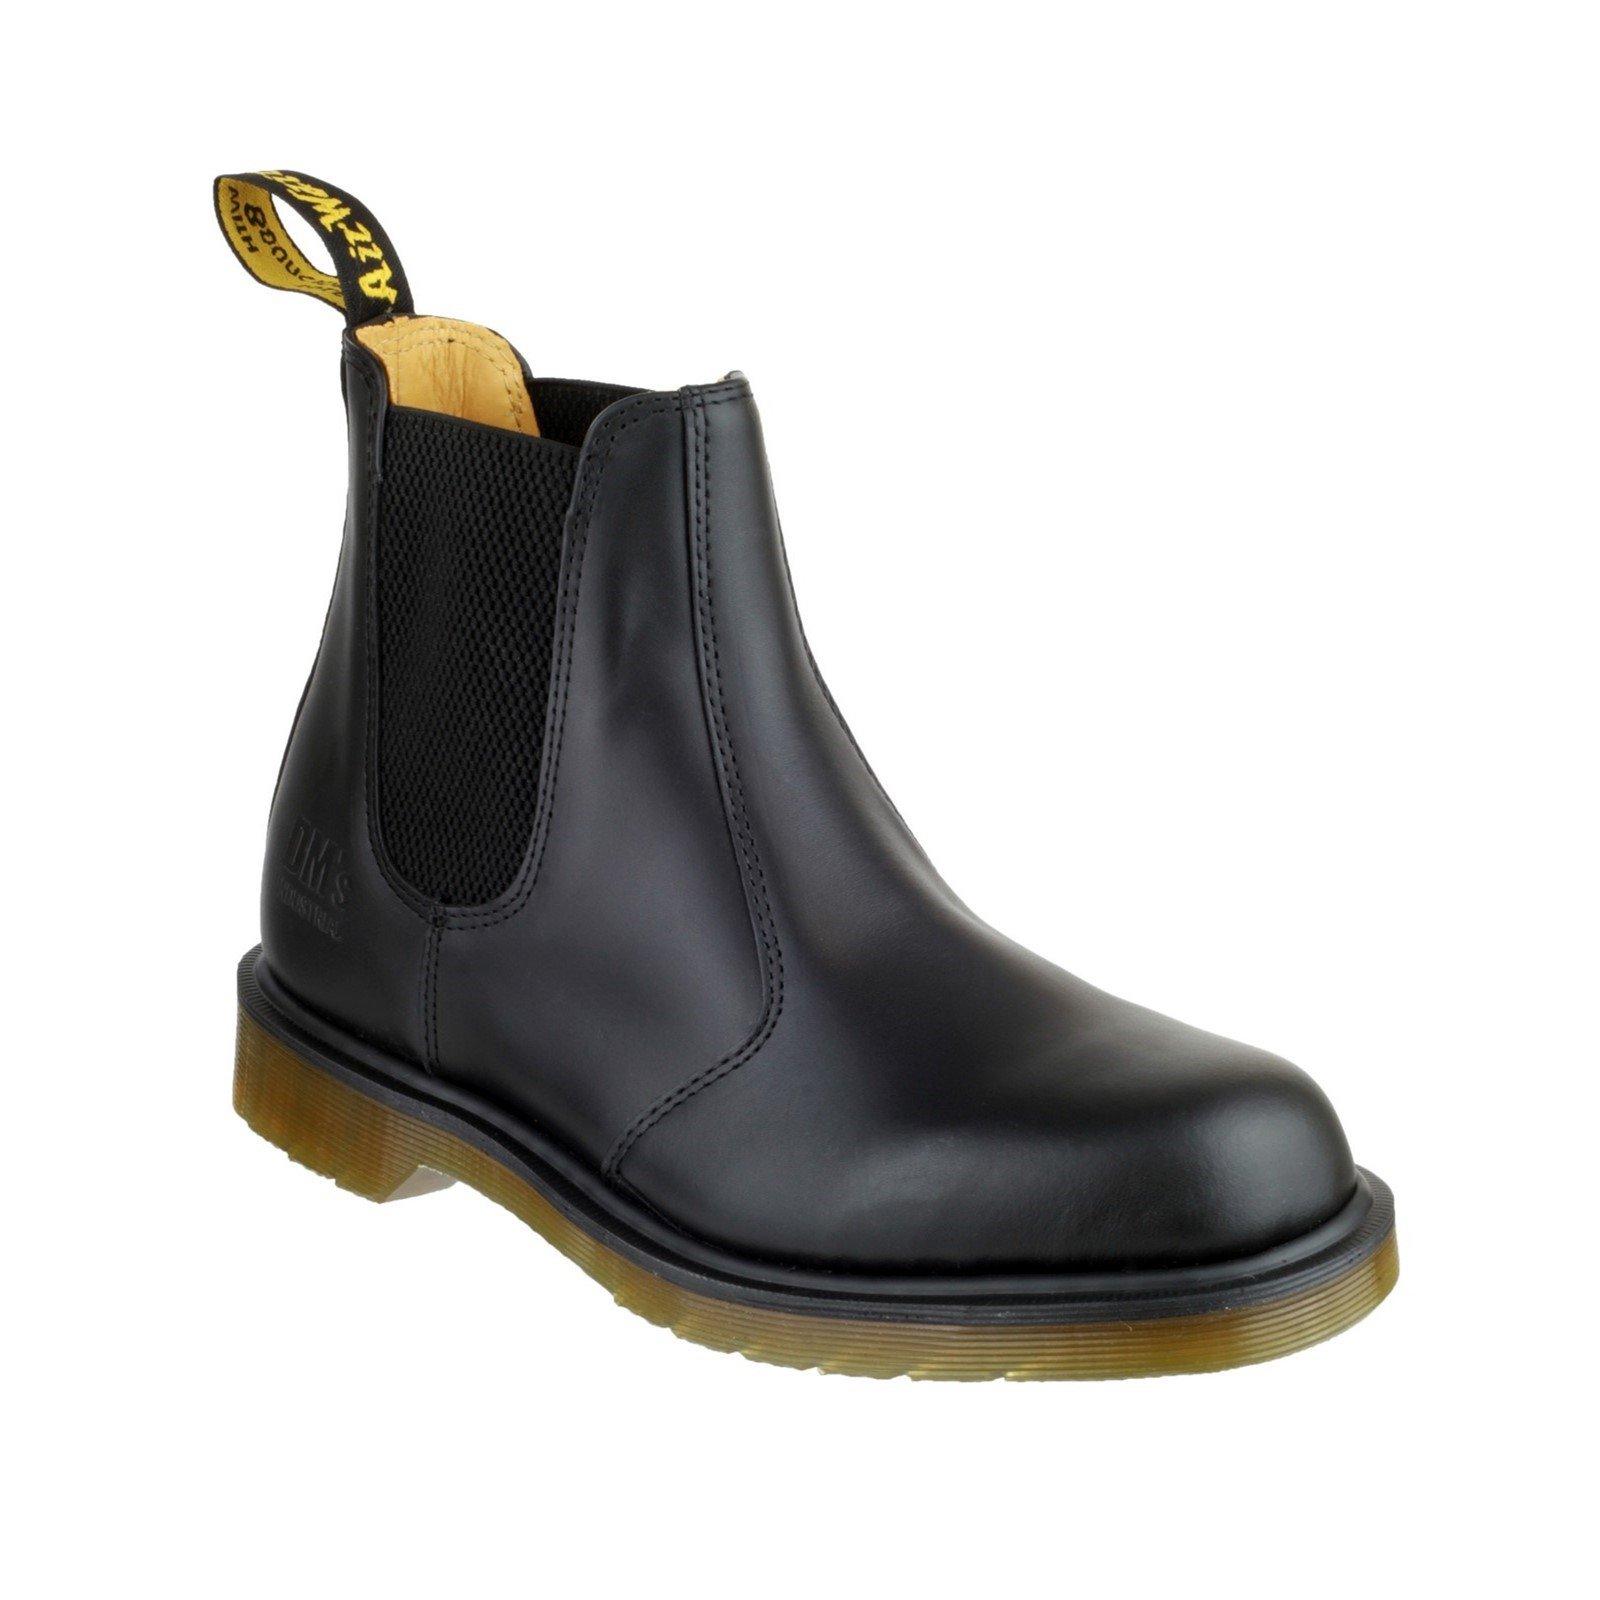 Dr Martens Men's Slip-On Dealer Boot Black 04916 - Black 10